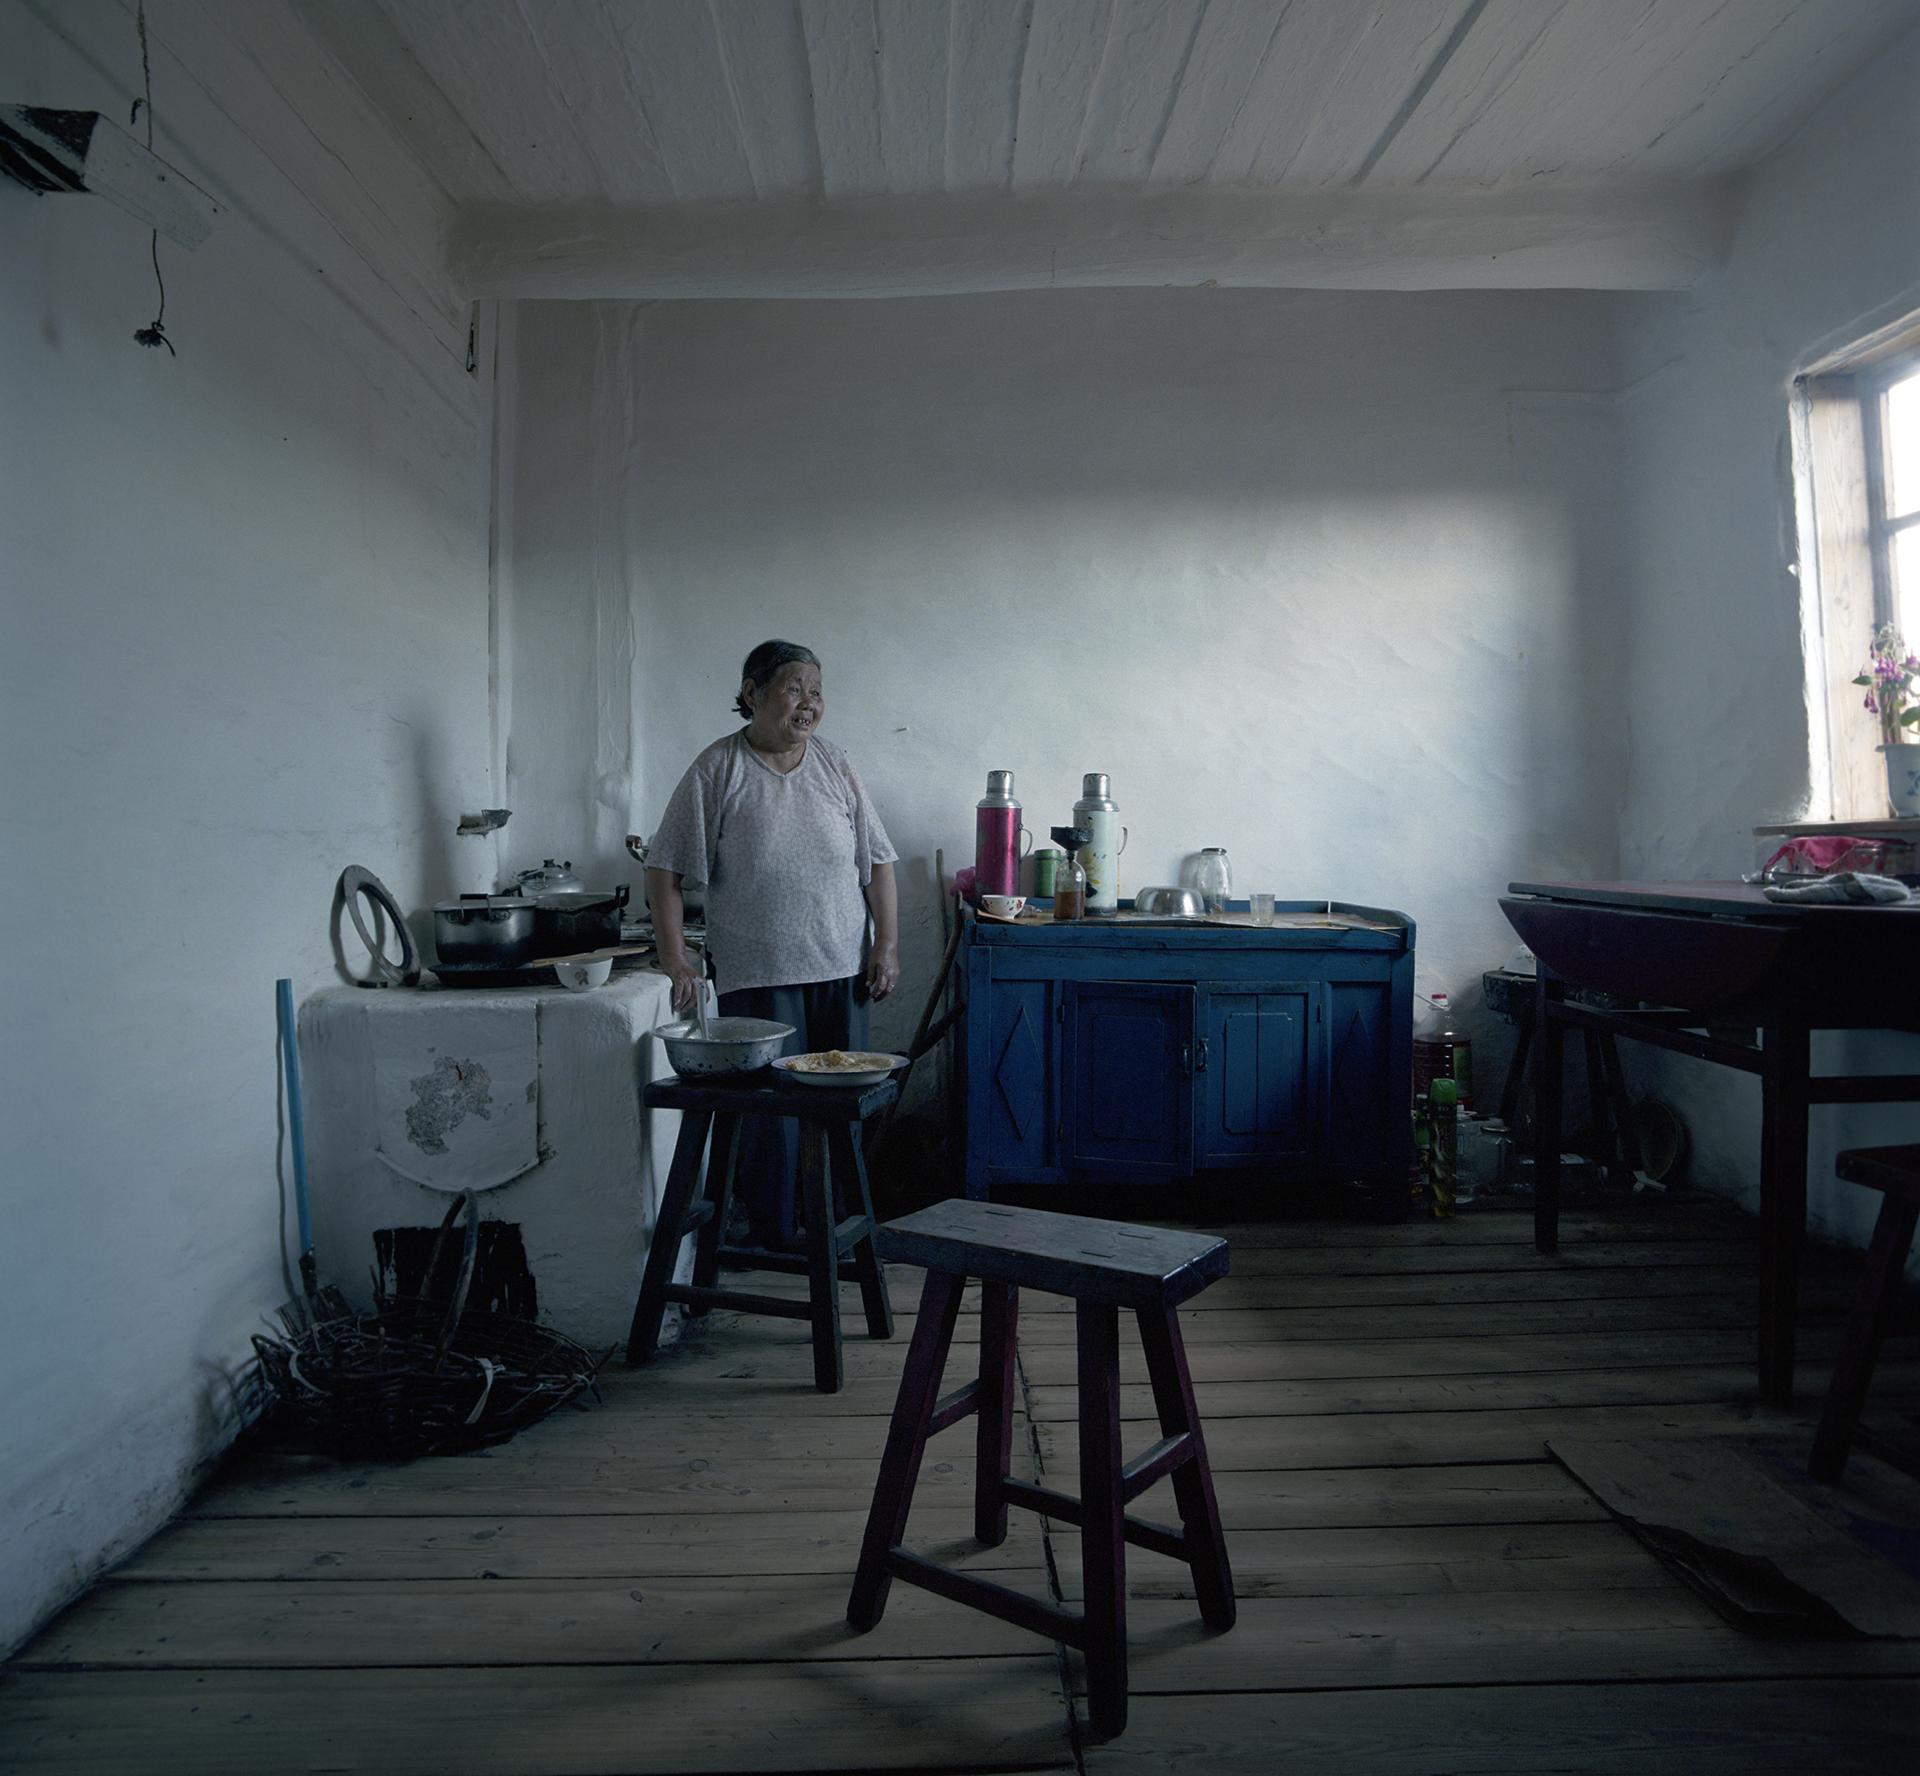 2008 Inner Mongolia - babouschka is baking real Russian blini's.